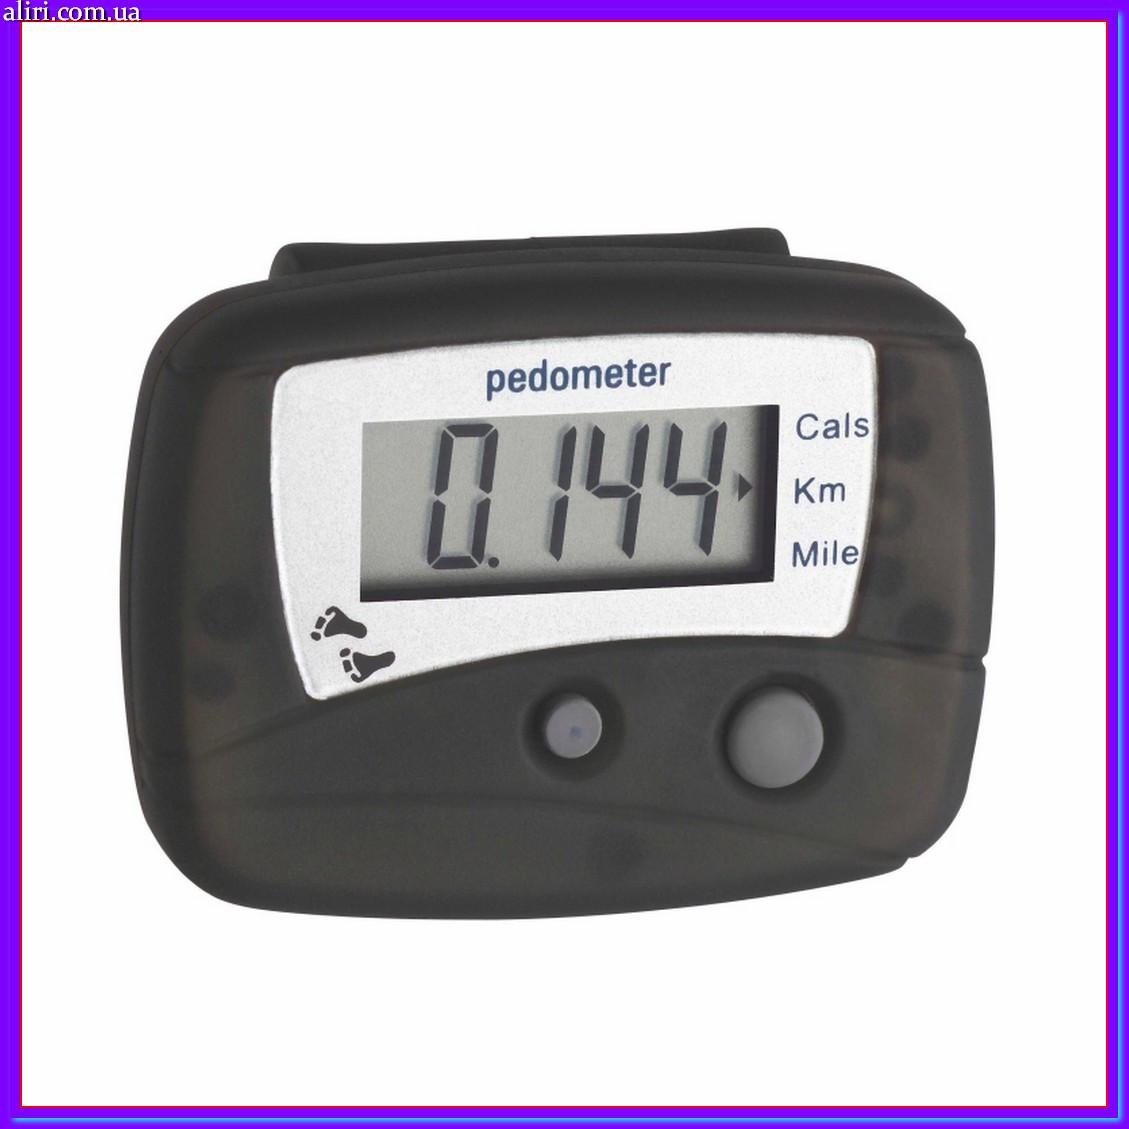 Шагомер,педометр, электронный цифровой шагомер со счетчиком каллорий,растояния